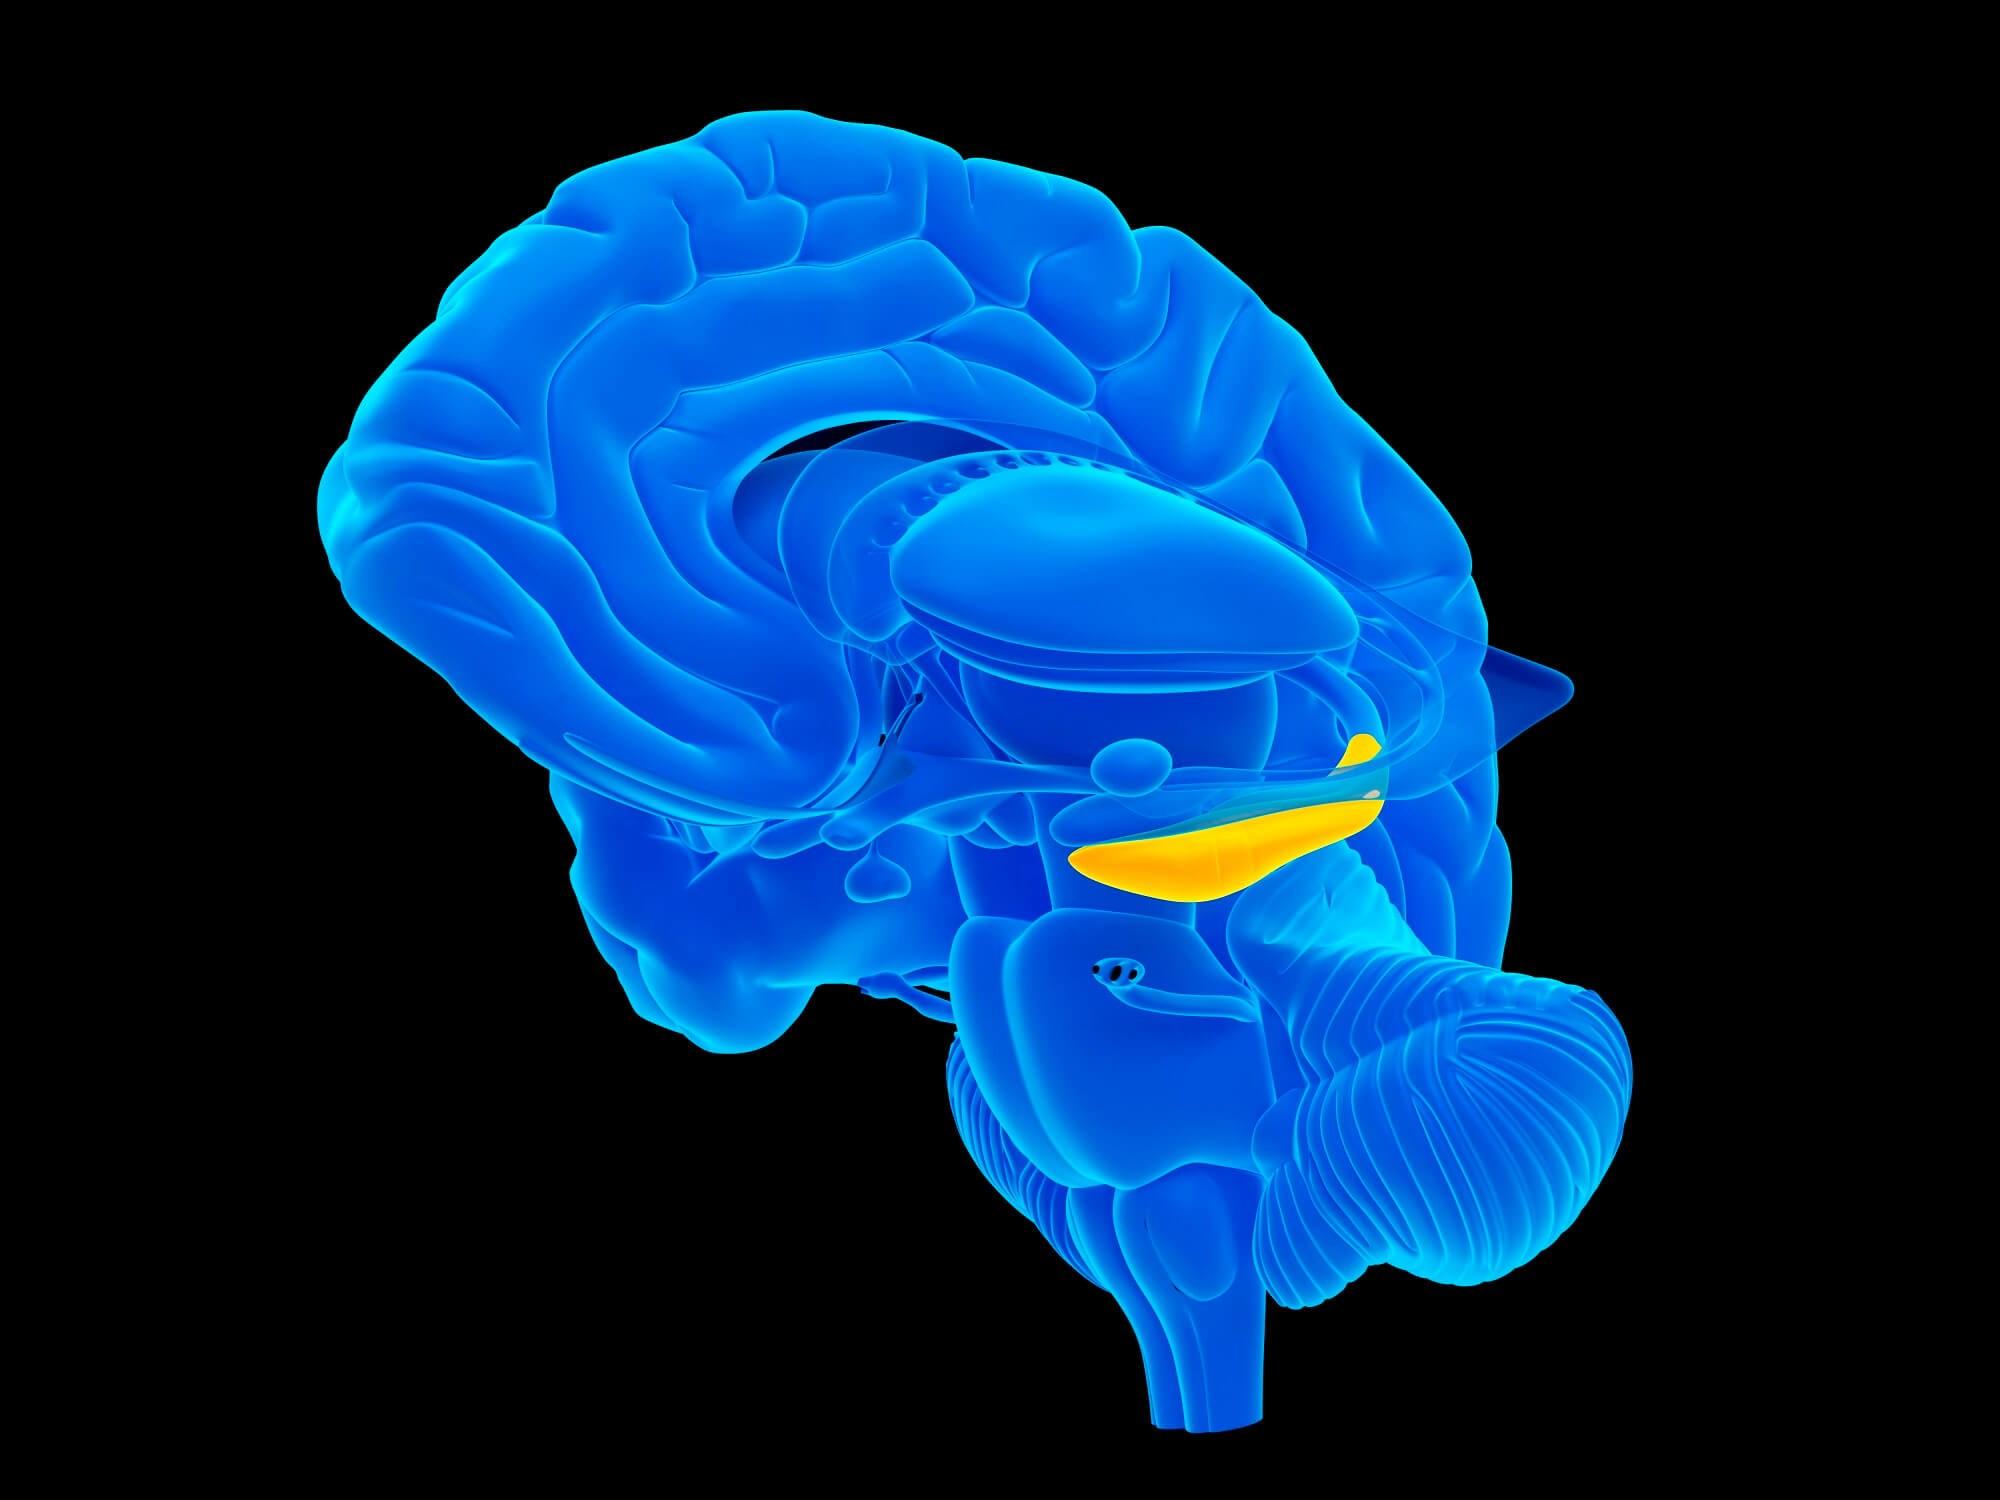 Autoimmune Diseases Increase Hippocampal Sclerosis Risk in Nonagenarians